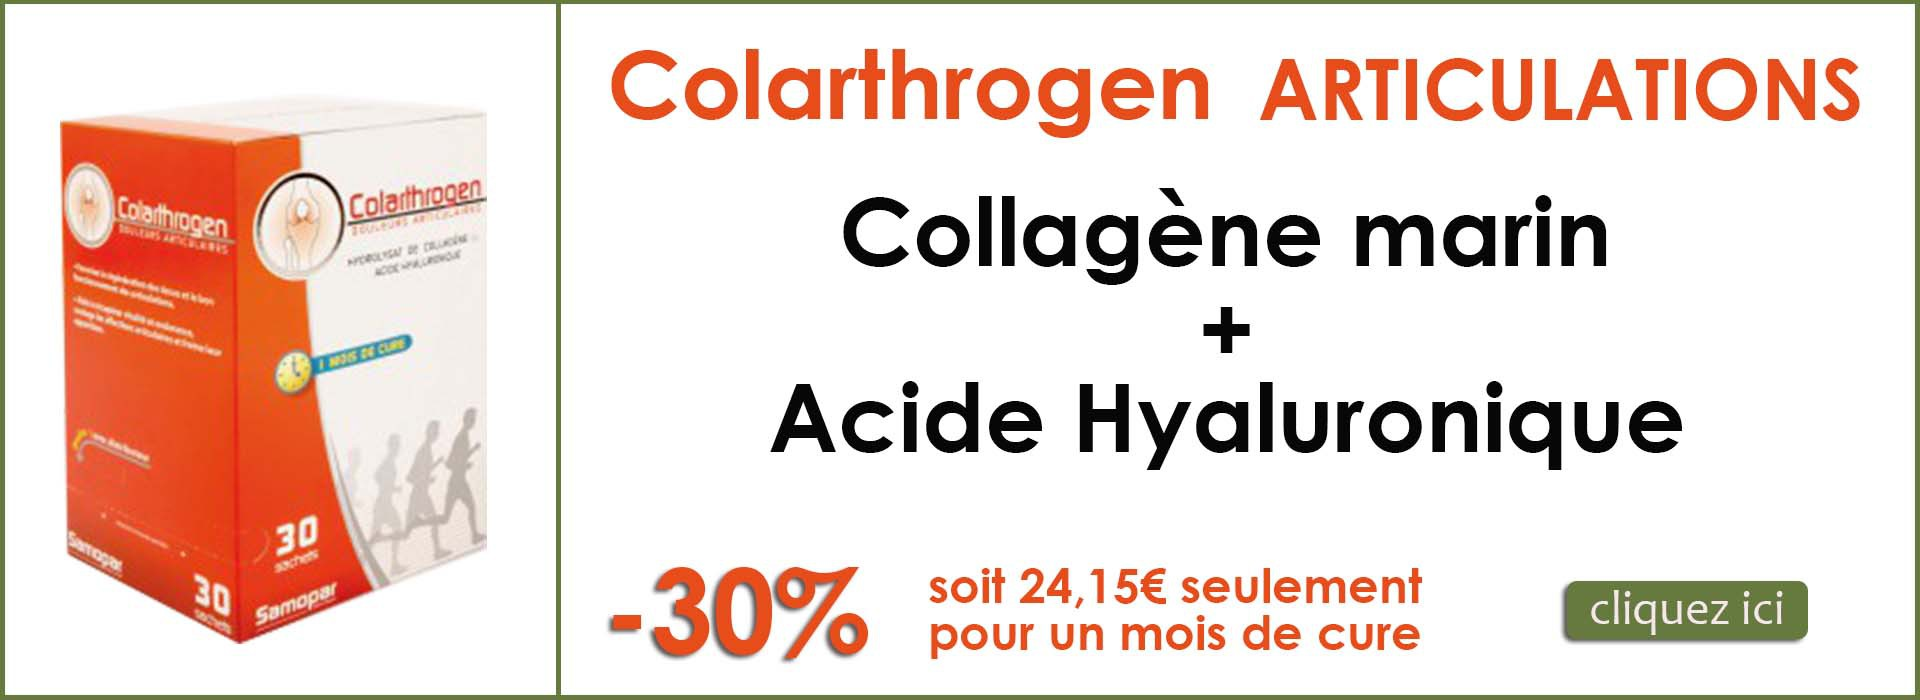 Colarthrogene collagene marin + acide hyaluronique articulations